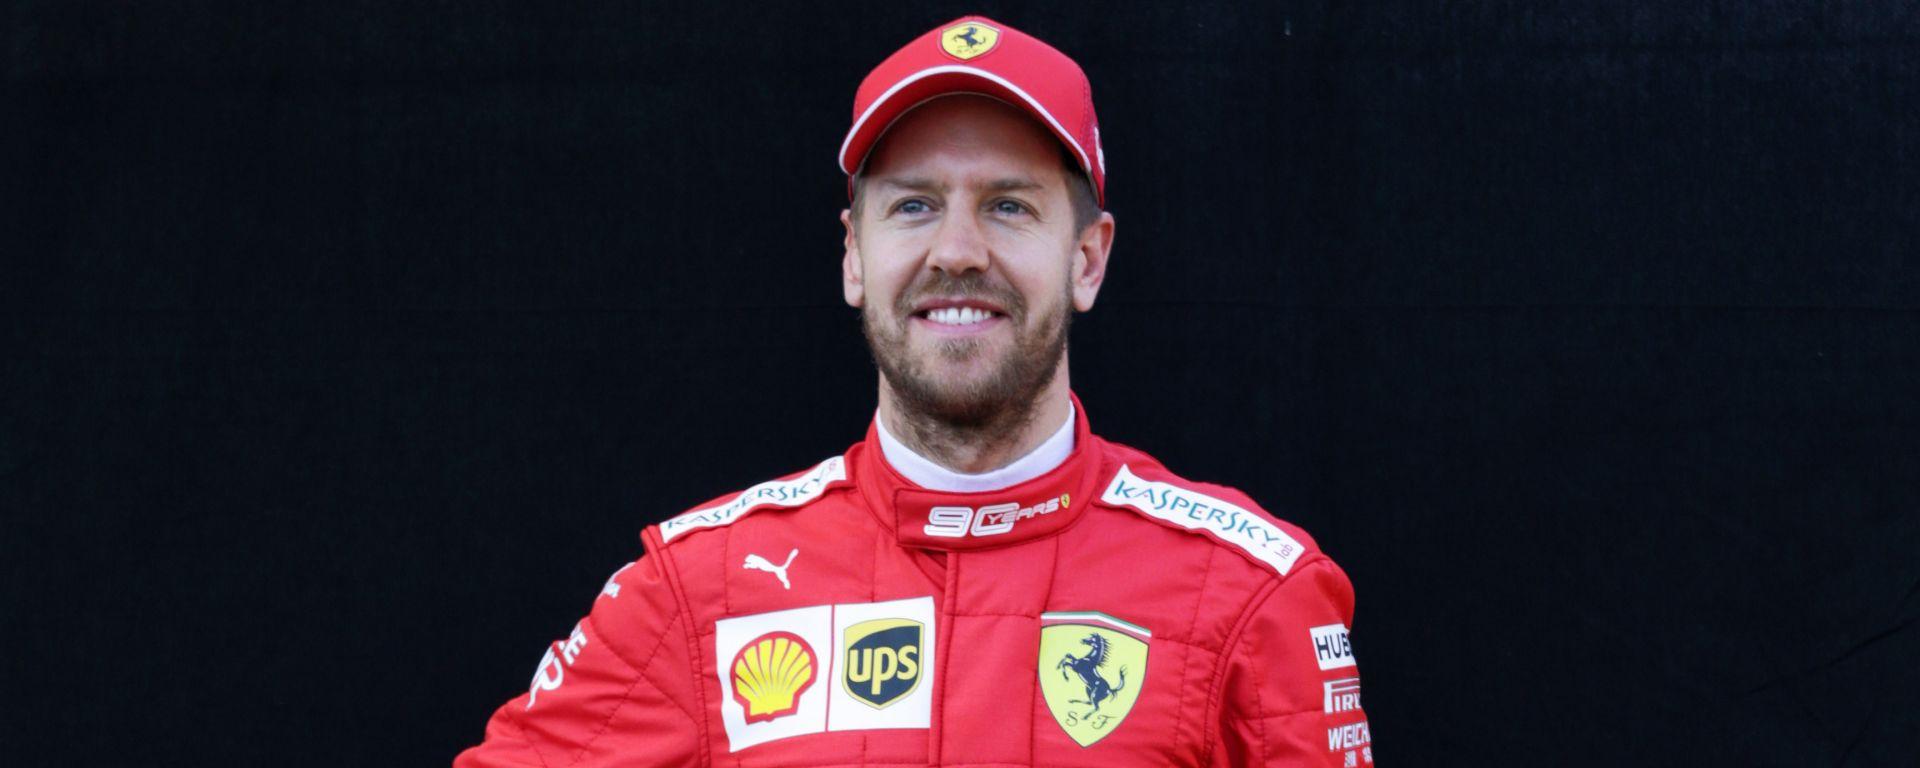 Sebastian Vettel #5 F1 2019